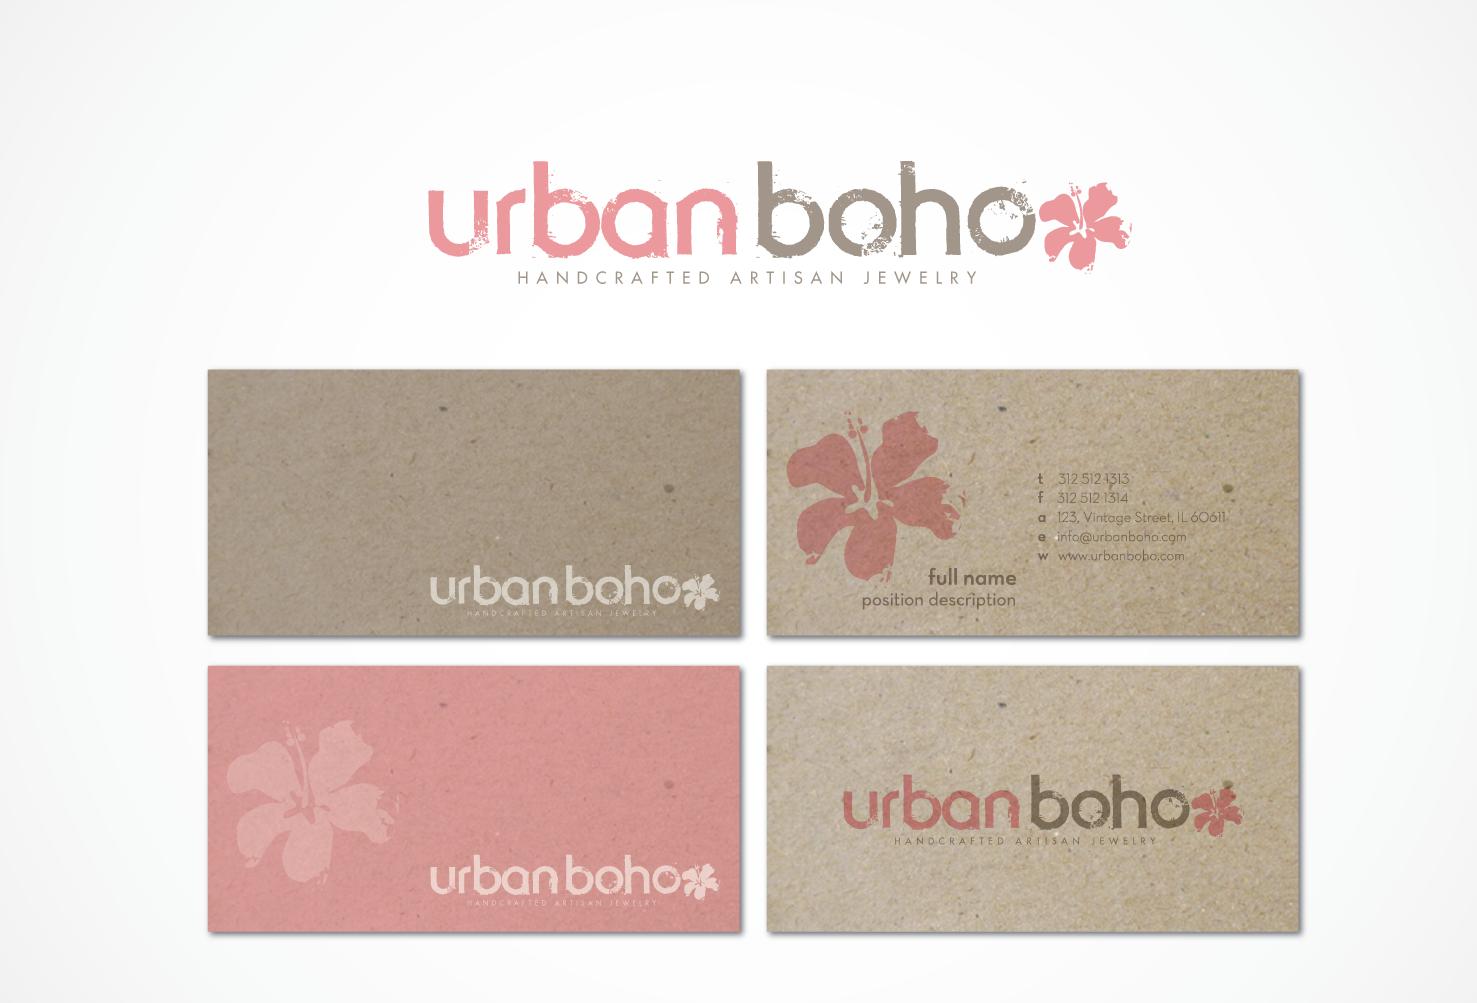 Help Urban Boho with a new logo